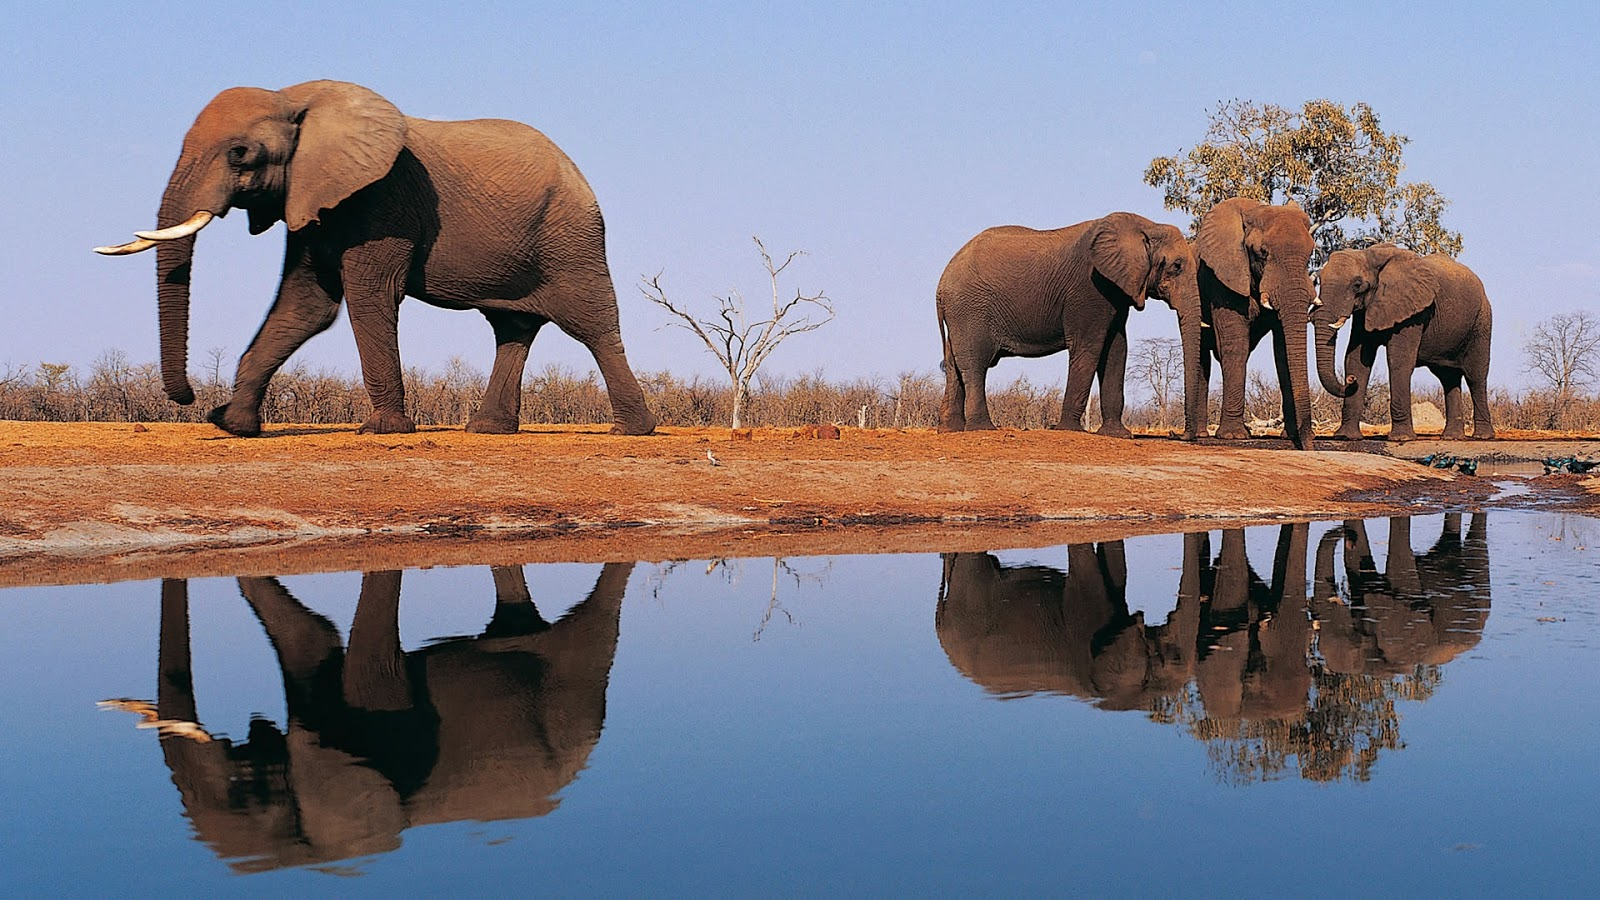 Wallpaper download elephant - 18291 Wild Elephants Animal Hd Wallpaperz